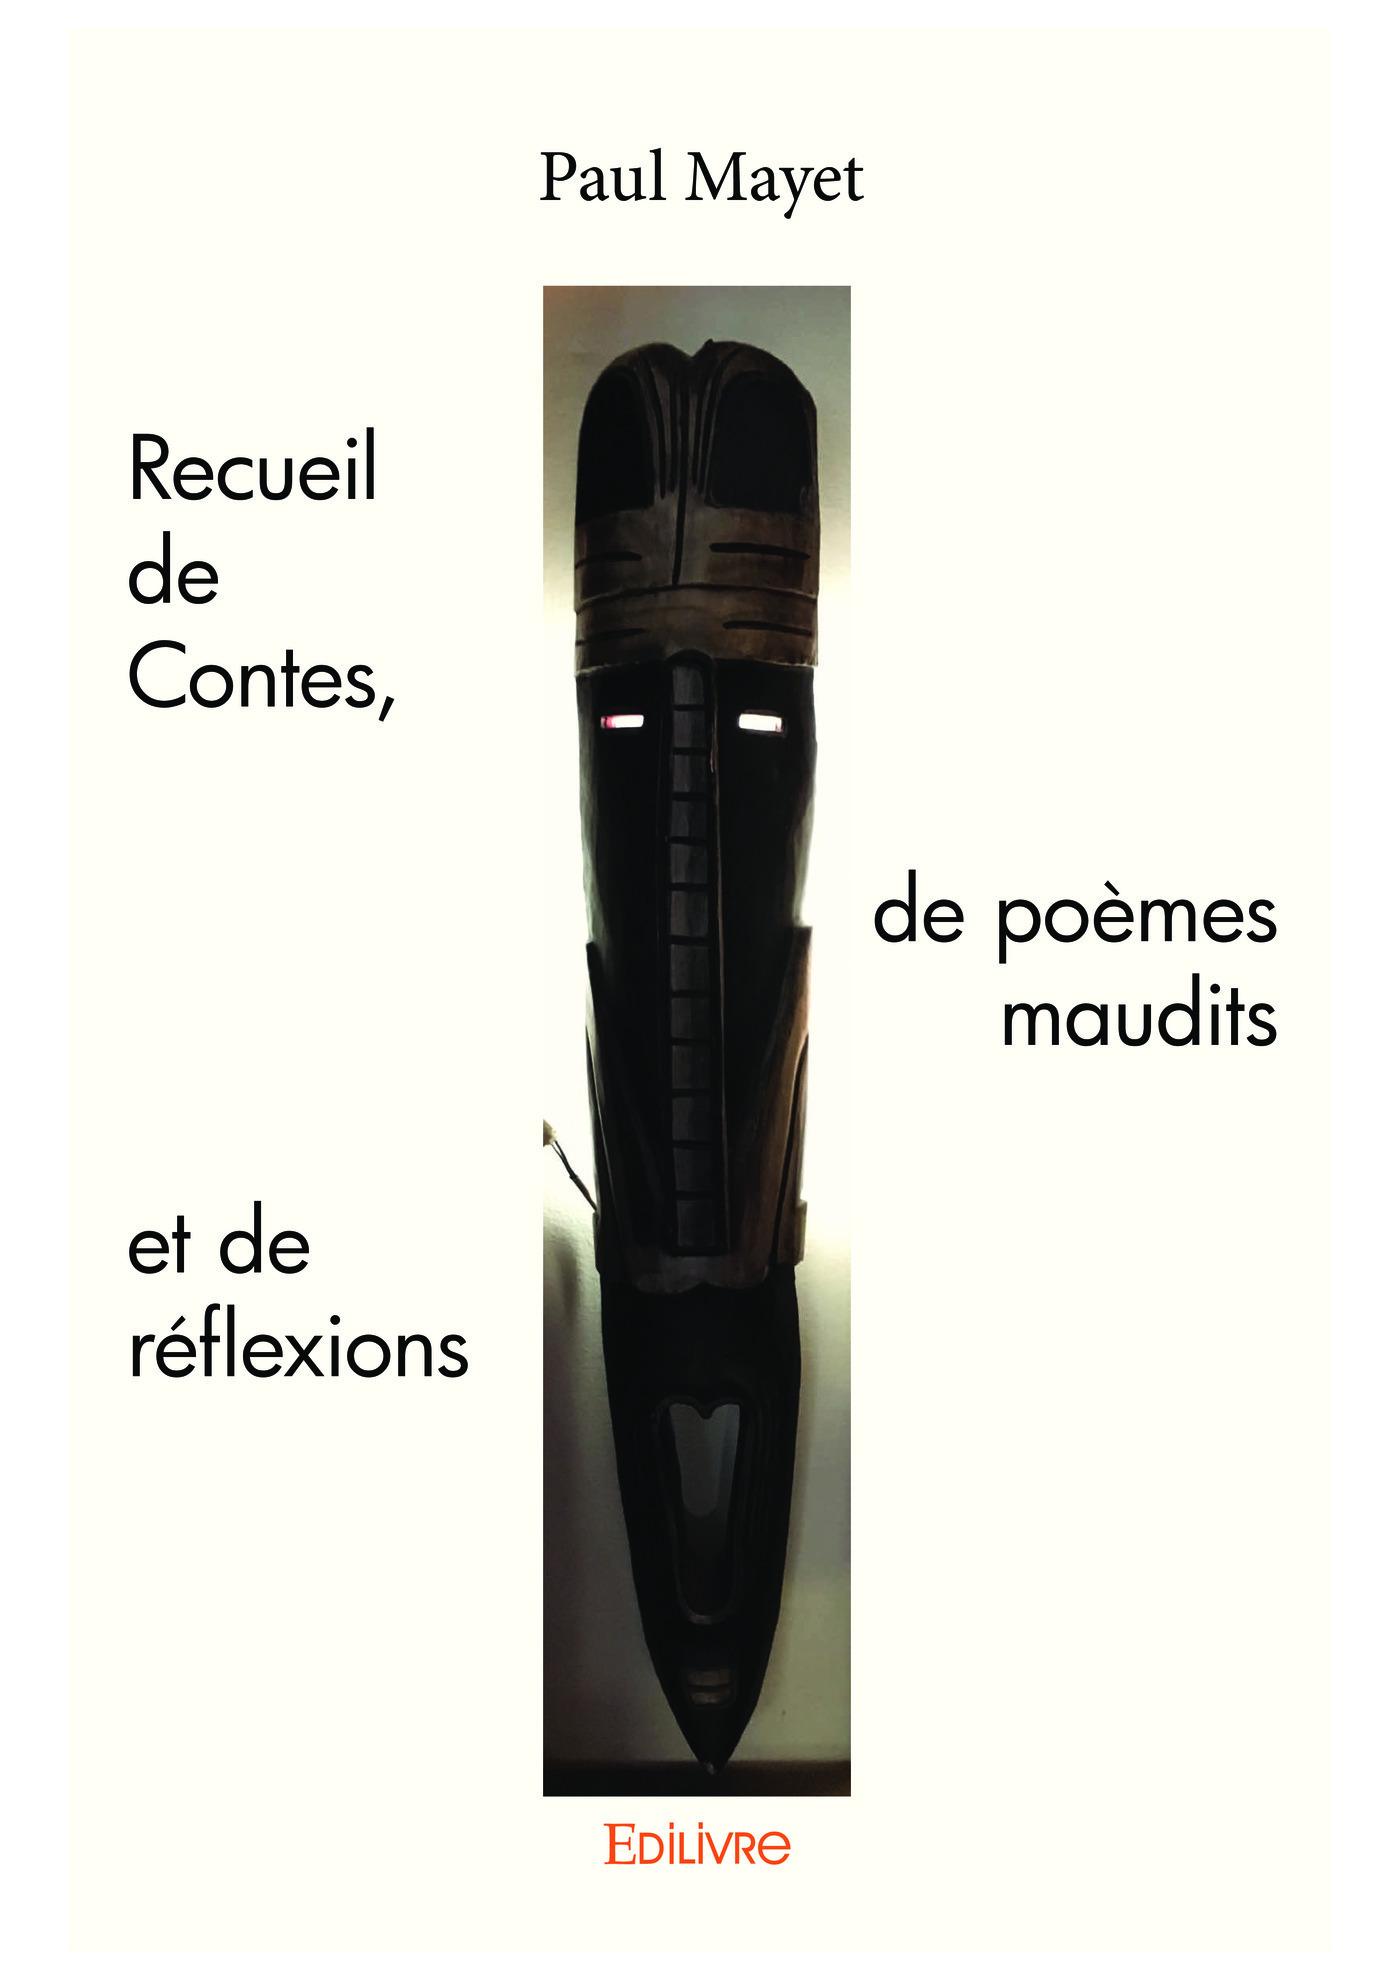 Recueil de contes, de poemes maudits et de reflexions